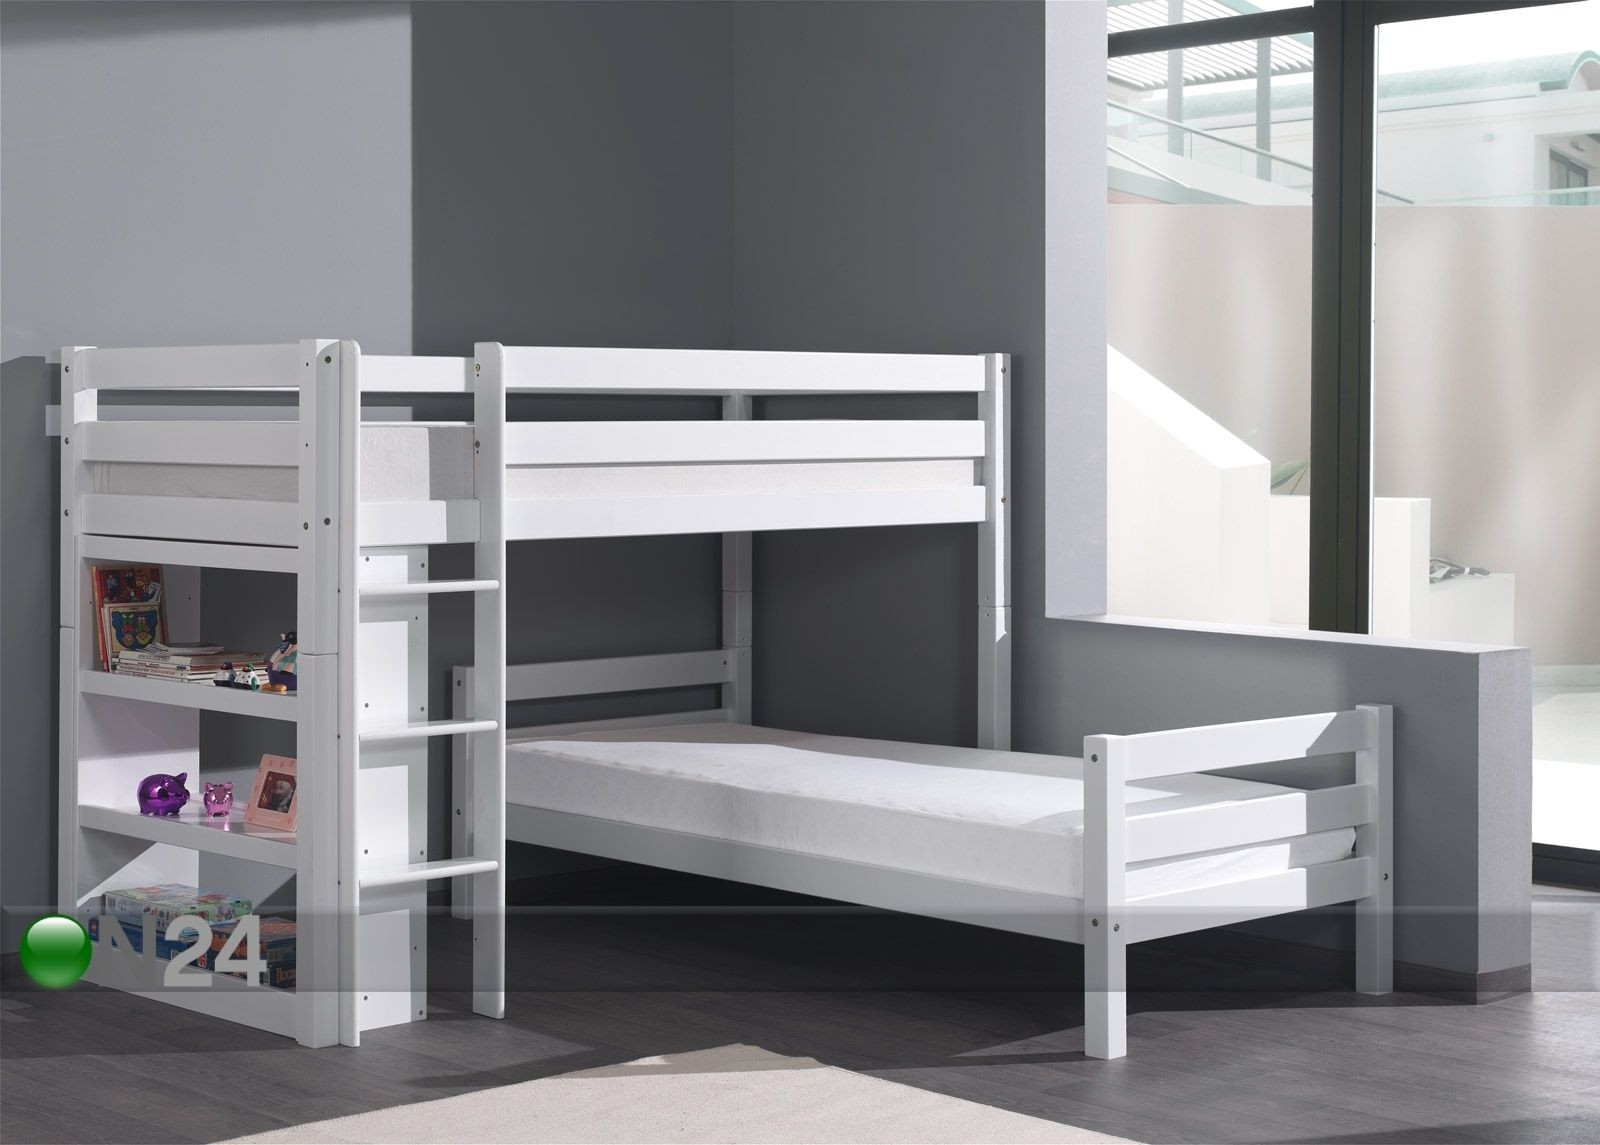 Corner Unit Twin Beds